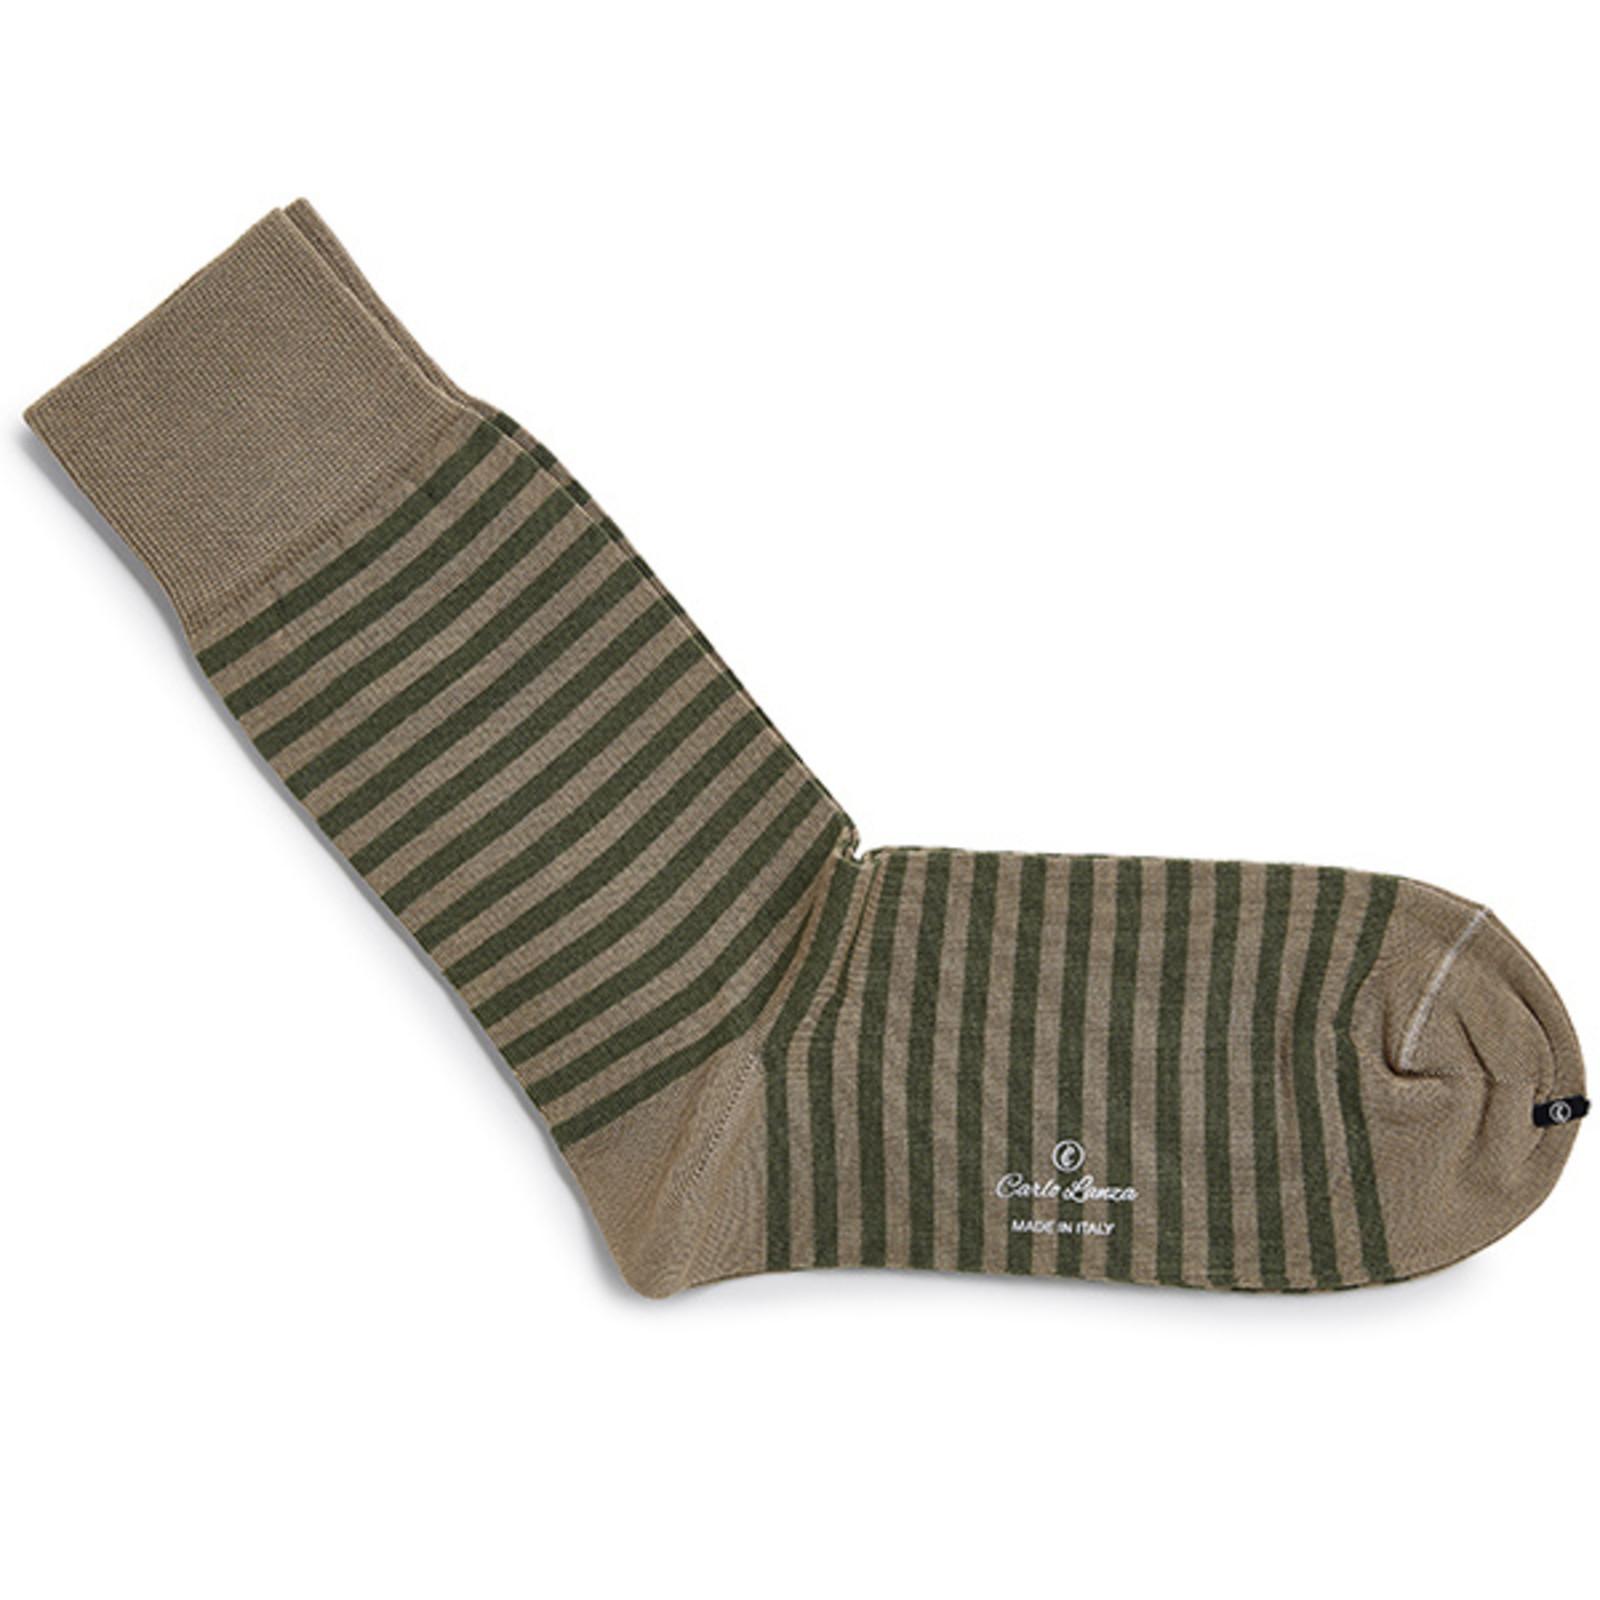 Carlo Lanza Olijfgroene streep sokken | Carlo Lanza